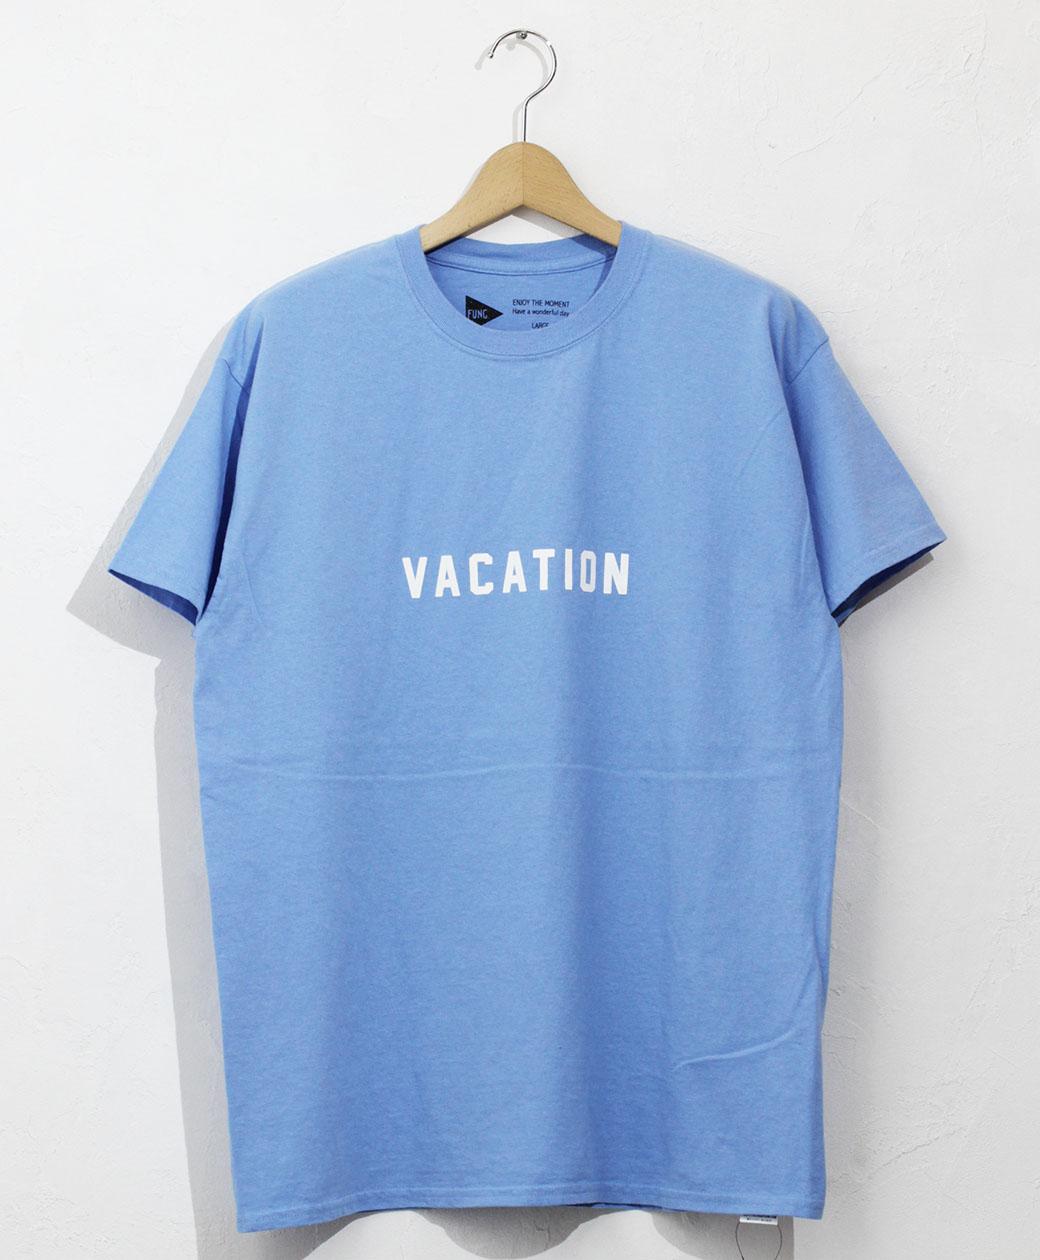 FUNG vacation(blue)